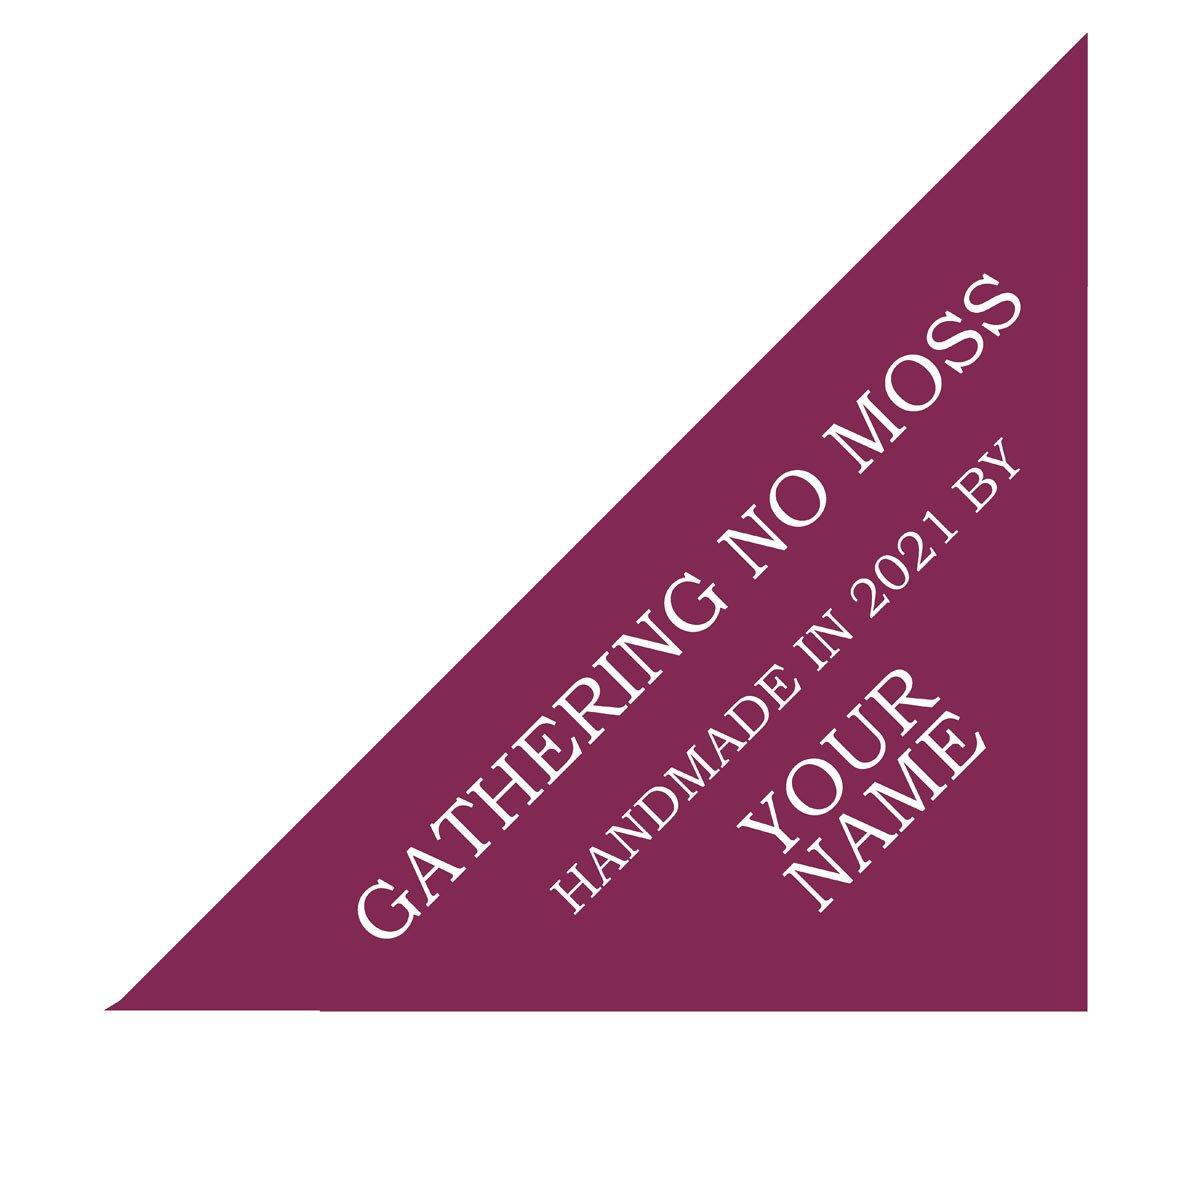 Gathering No Moss Custome Quilt Label Gemstone